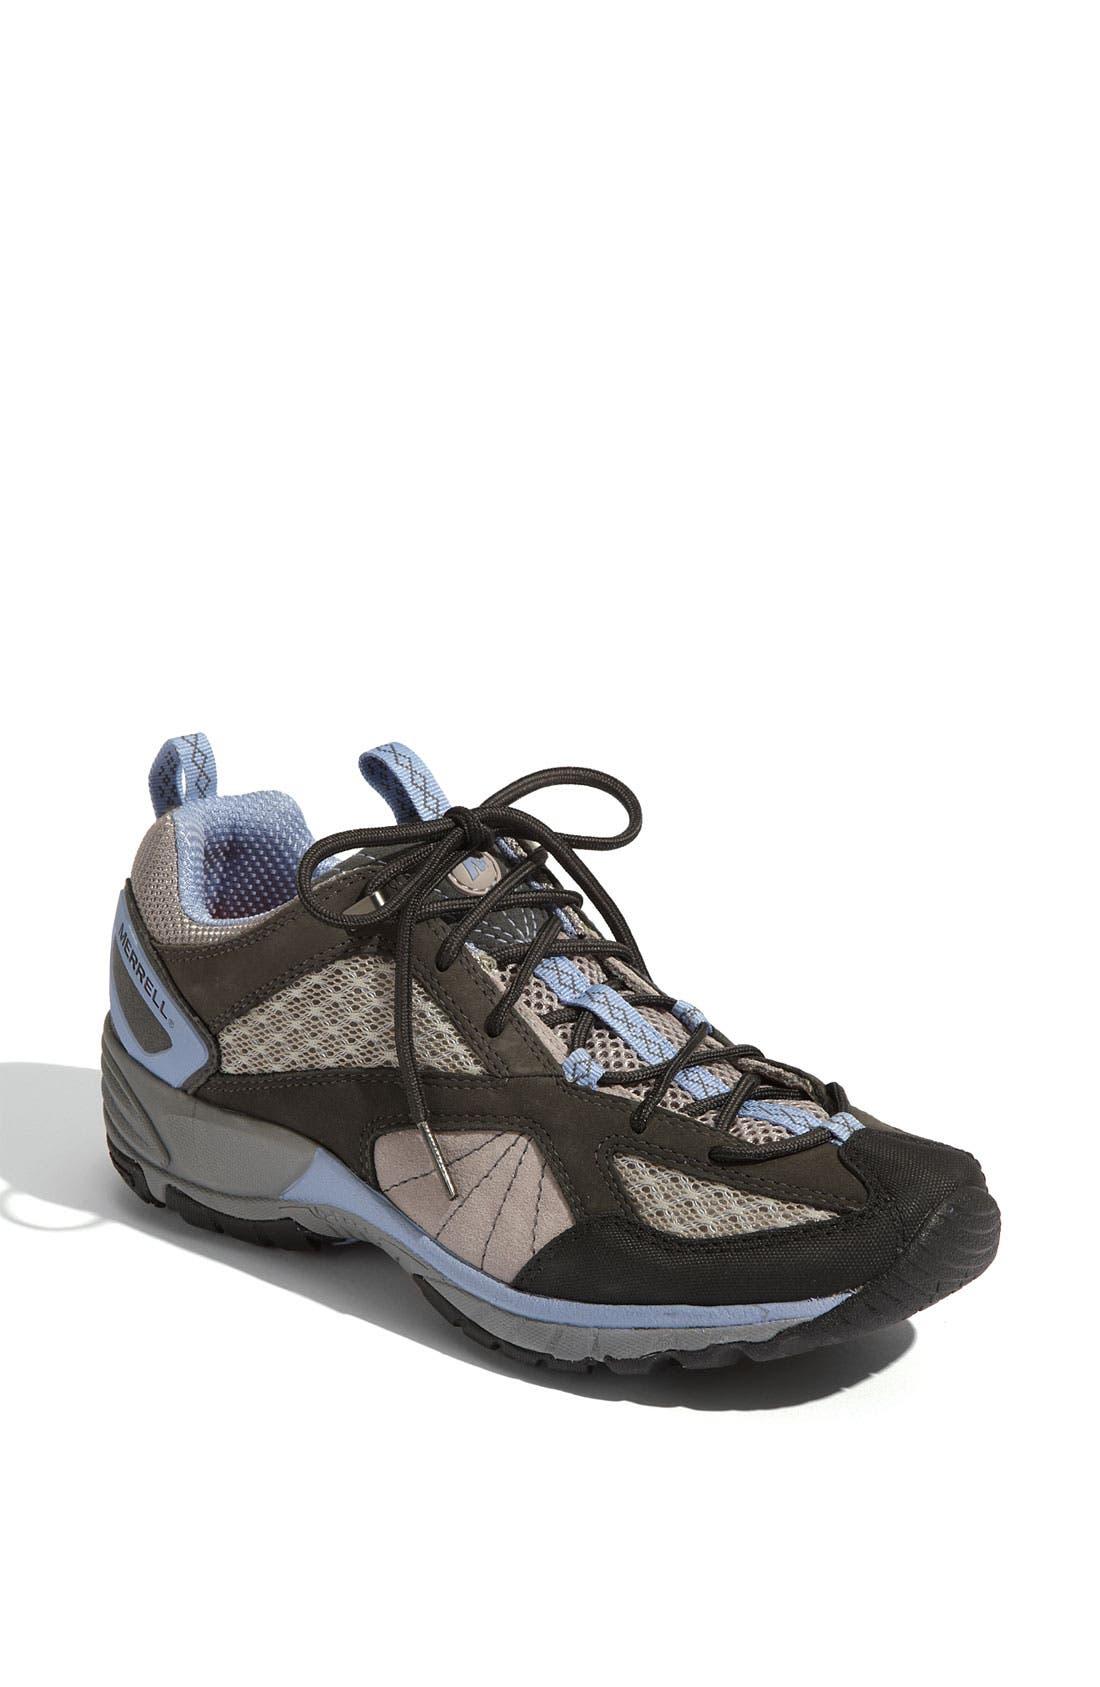 Main Image - Merrell 'Avian Light Ventilator' Hiking Shoe (Women)